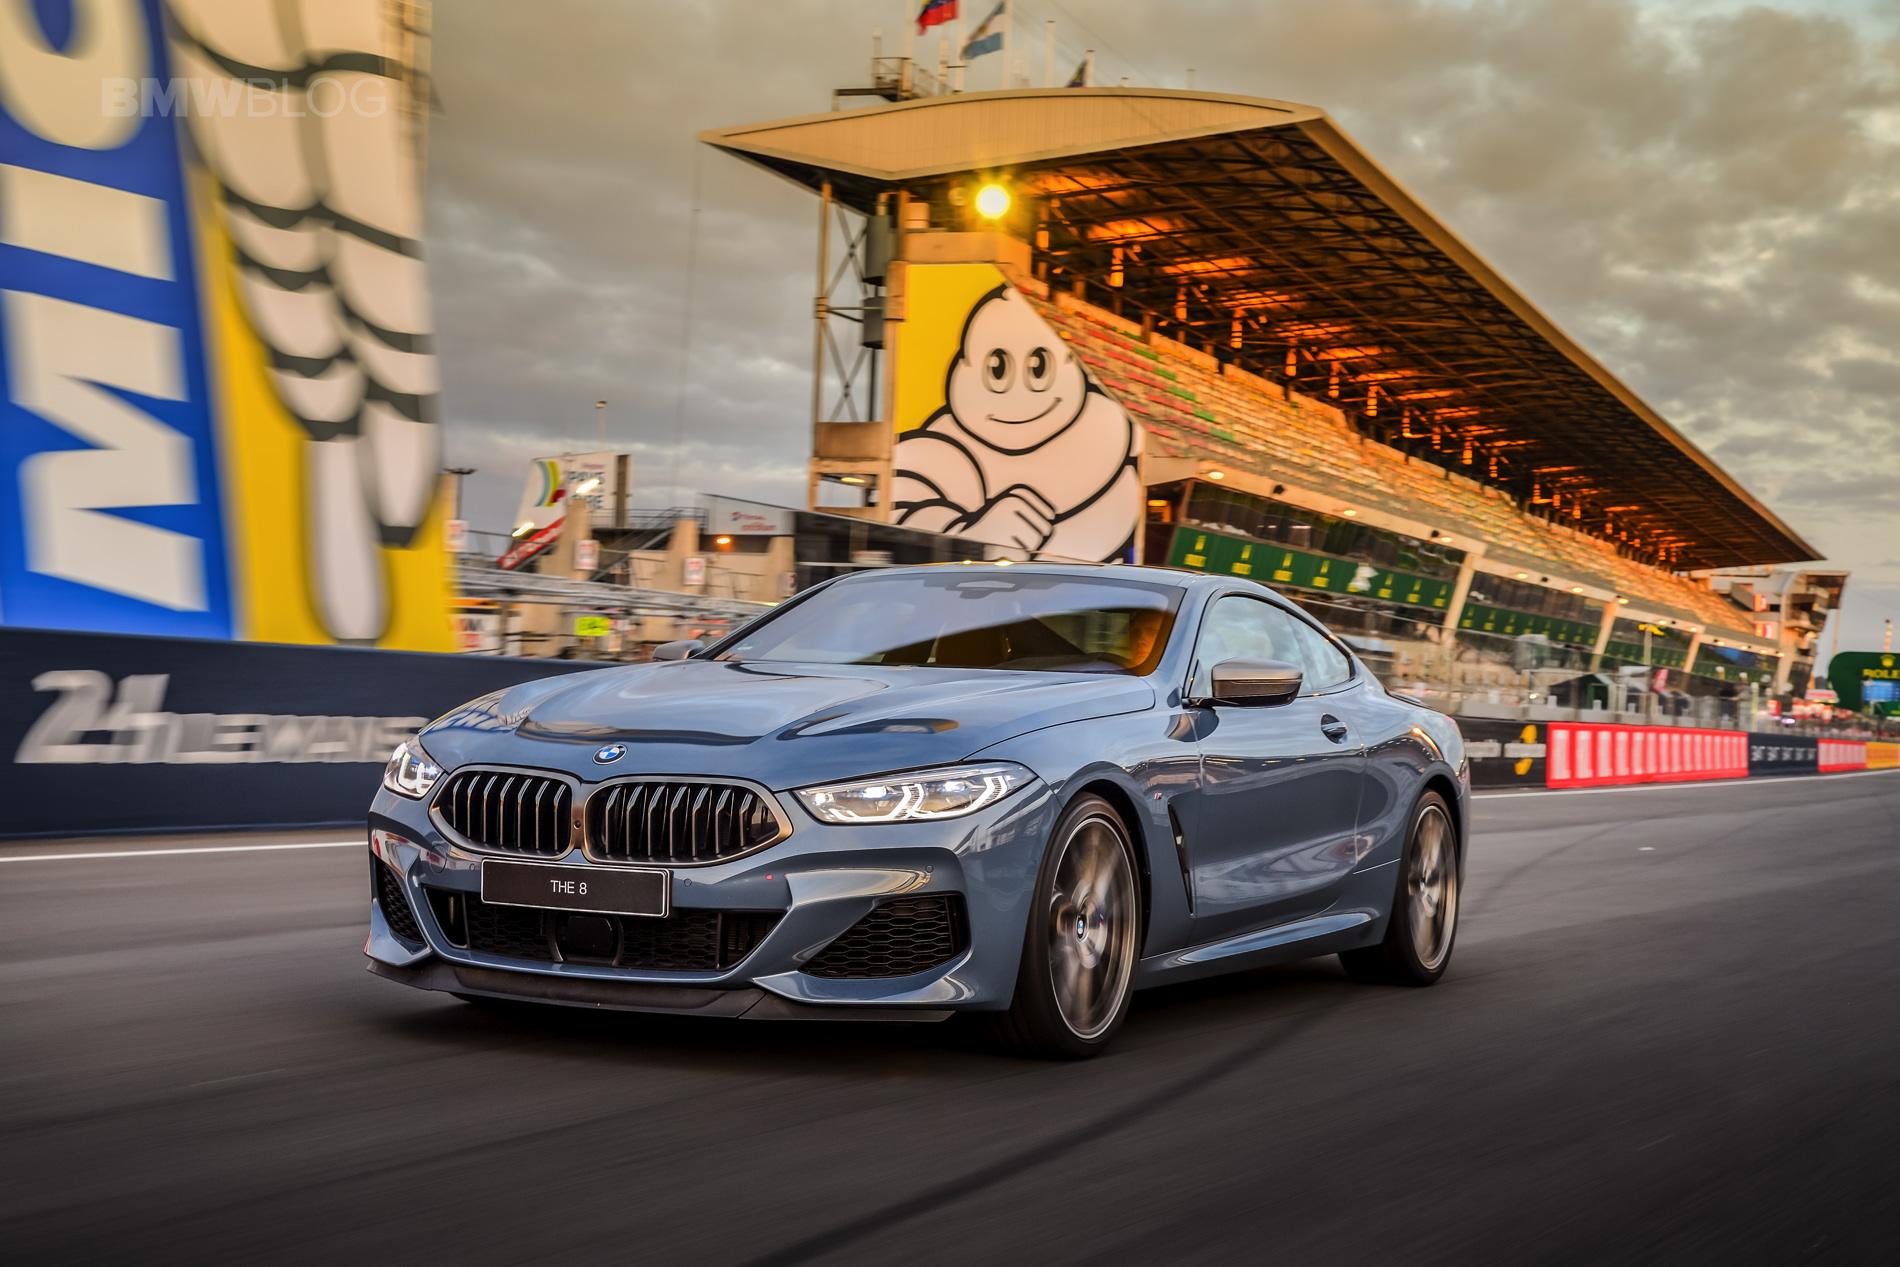 BMW 8 Series track Le mans 2018 06